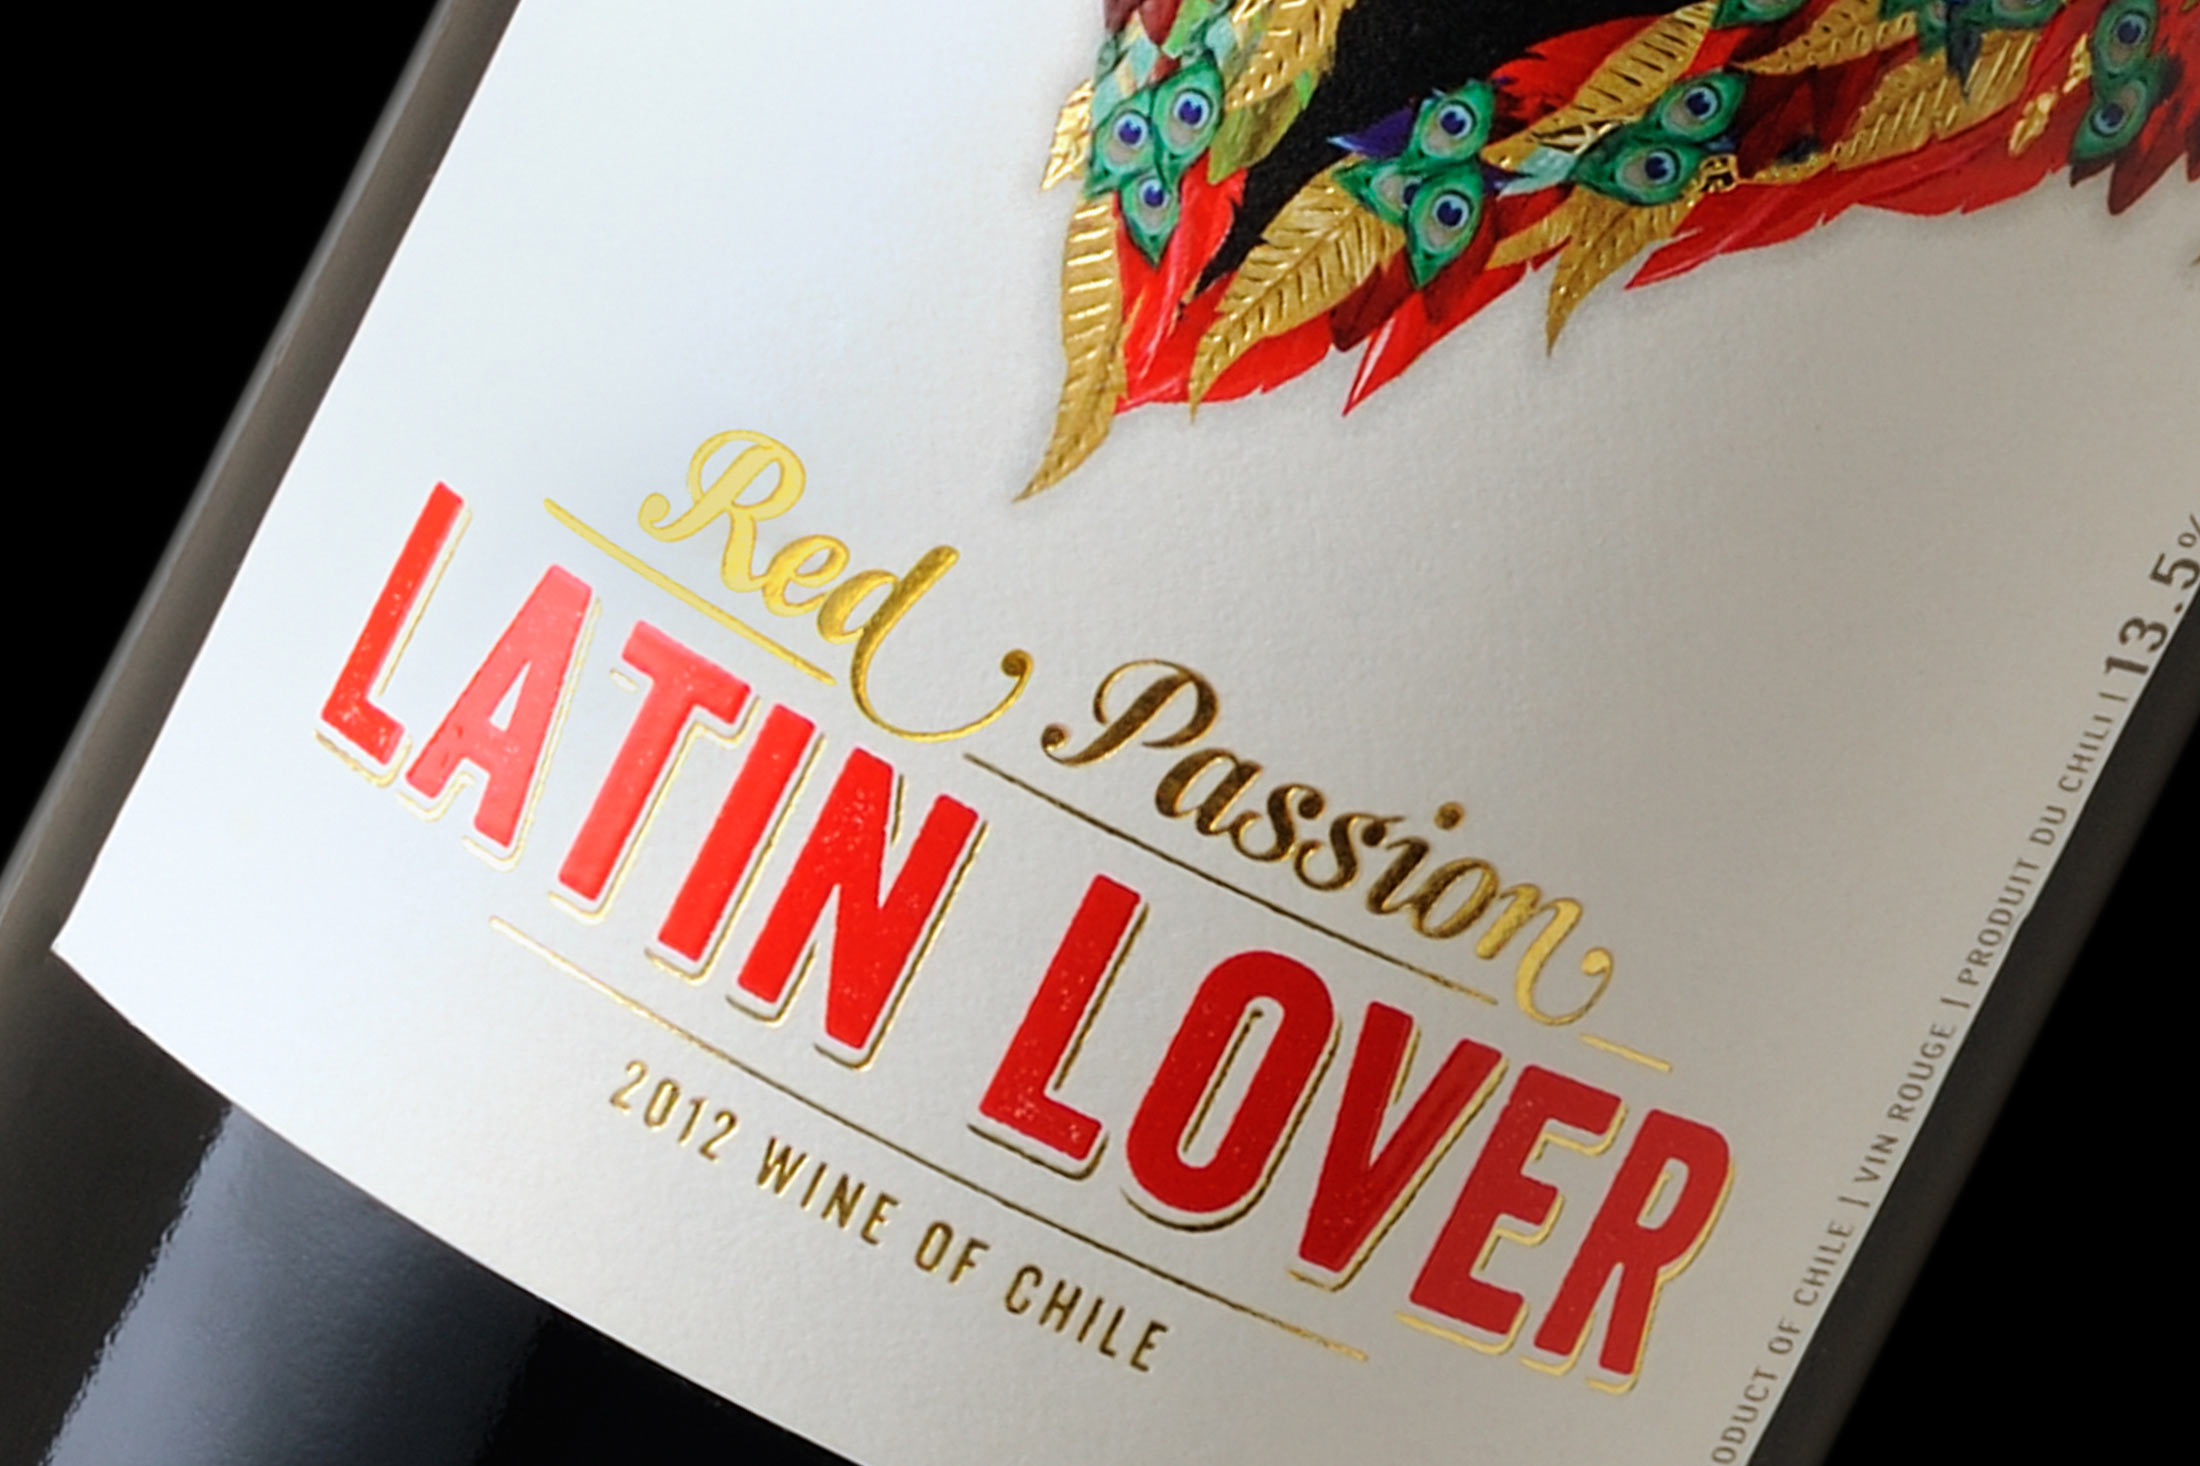 LaurieMillotte-Latin-Lover-3.jpg